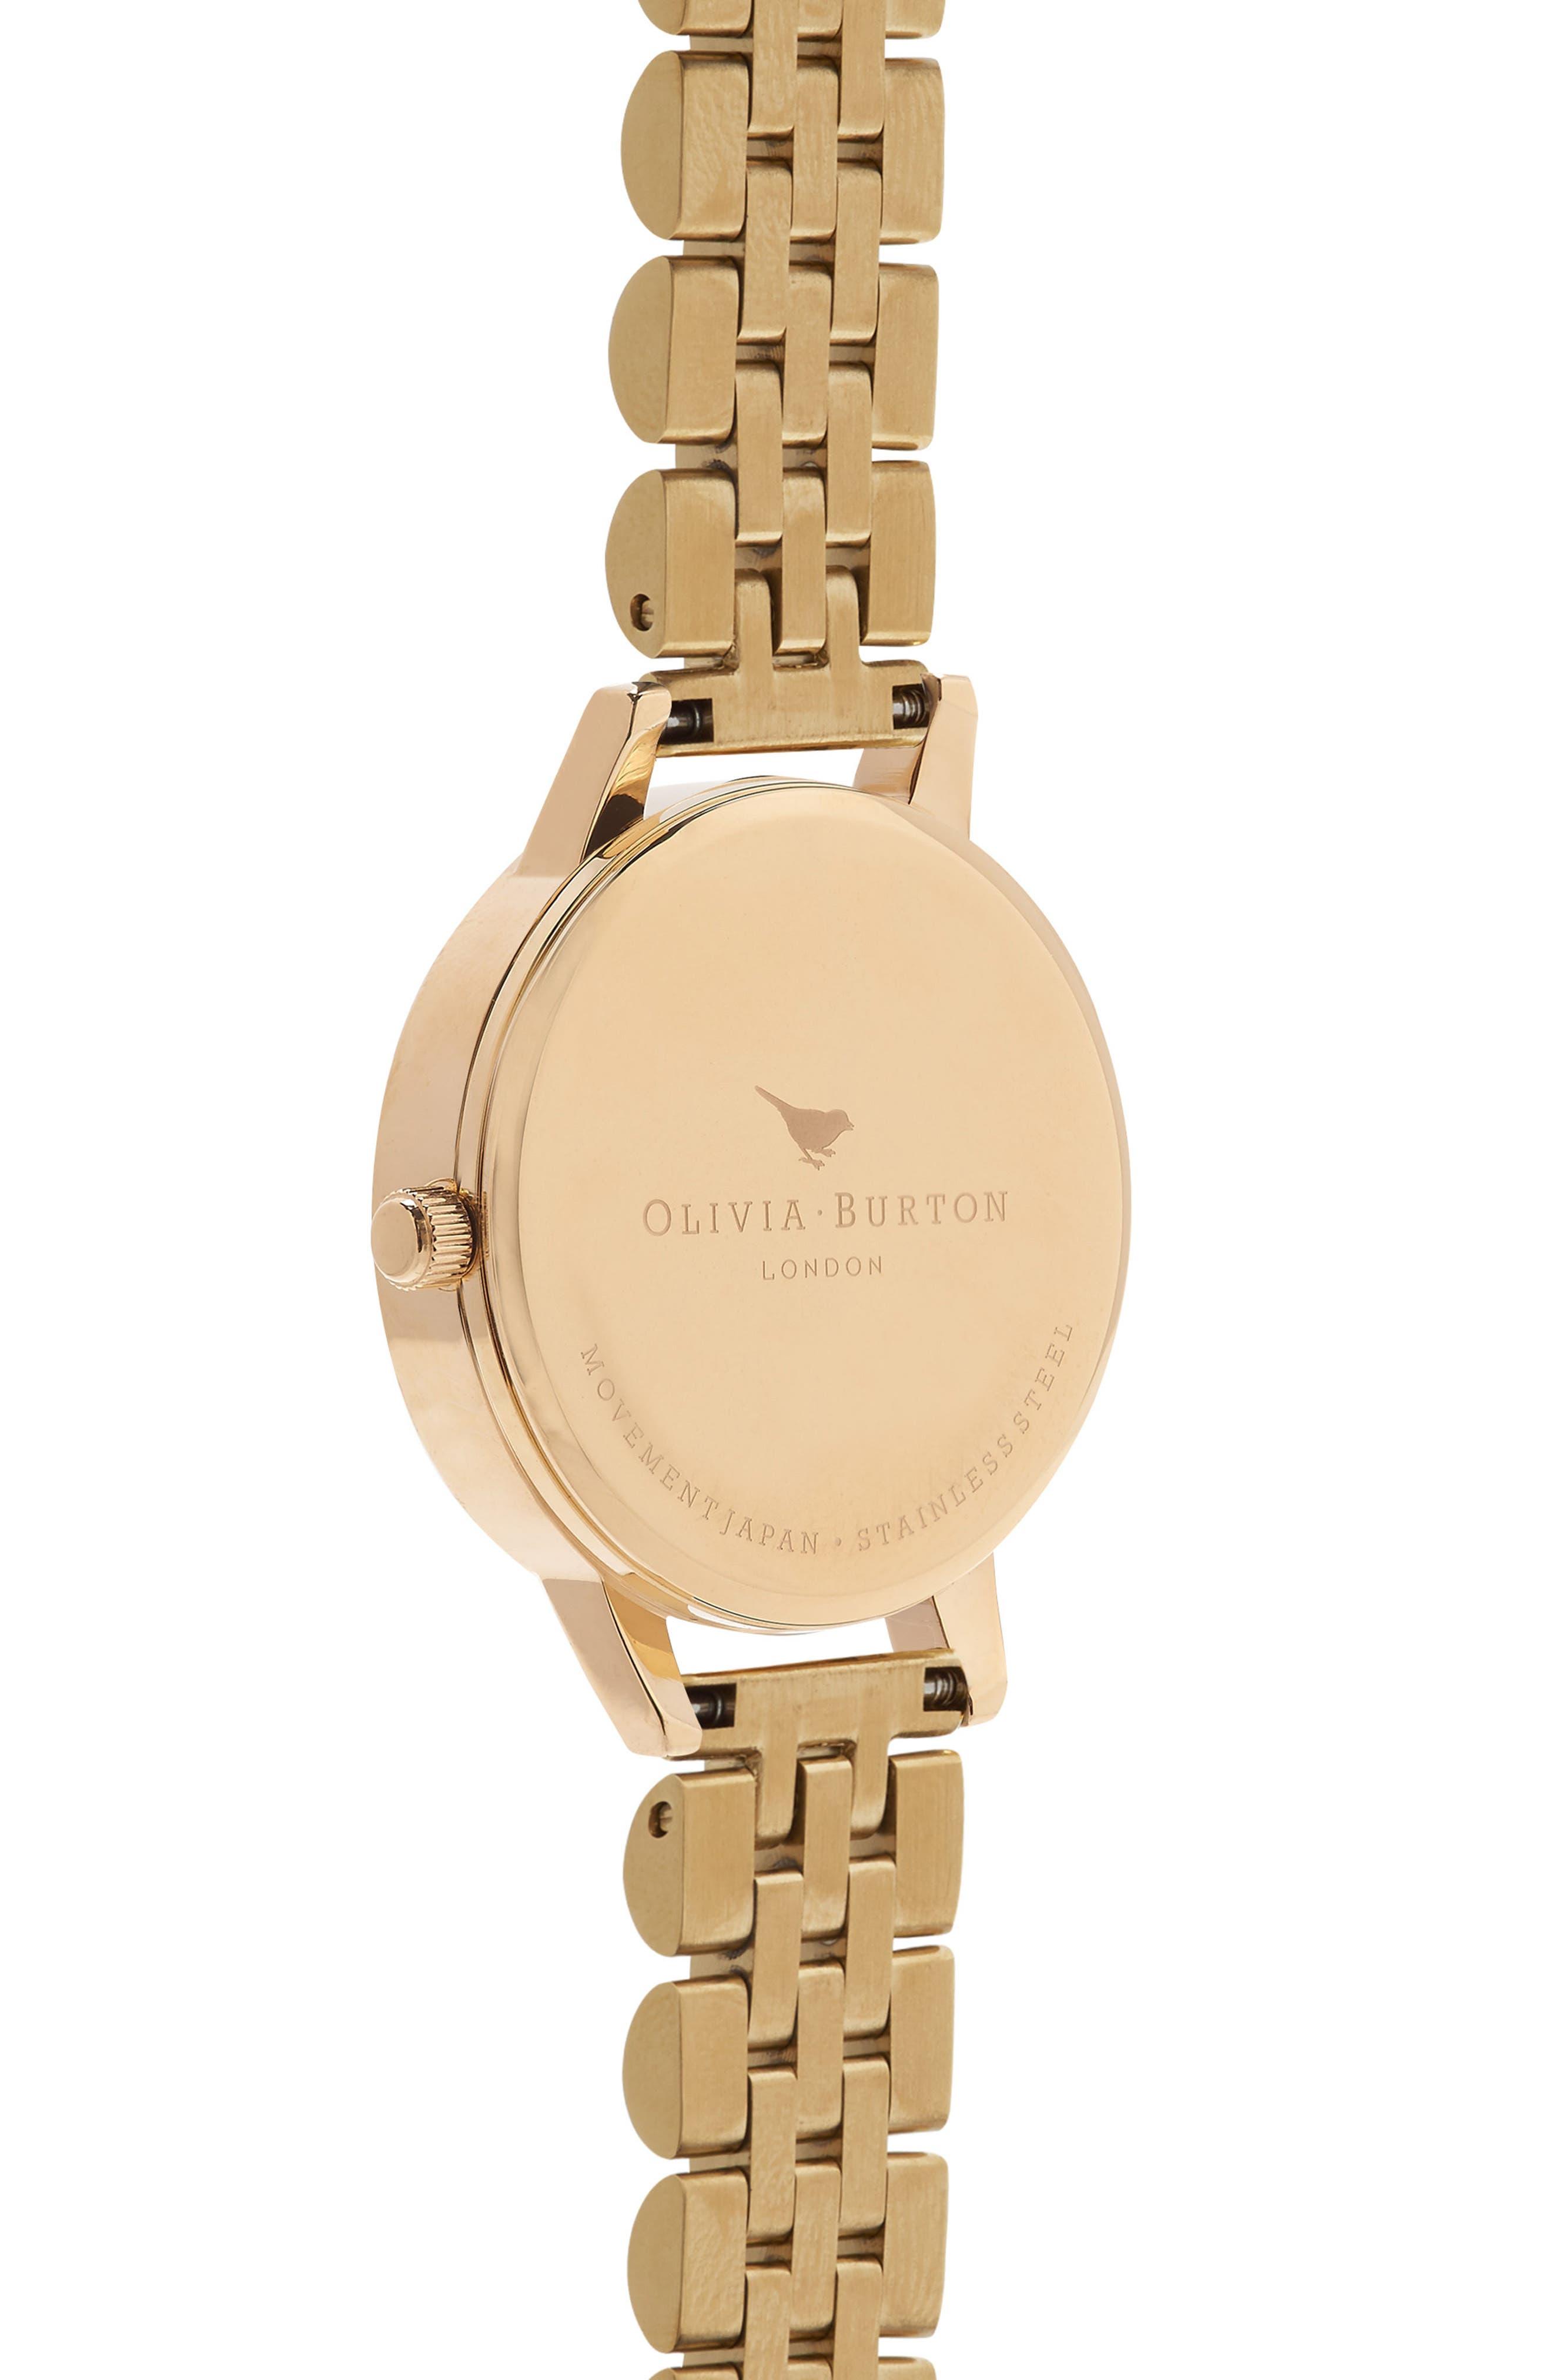 OLIVIA BURTON, Wonderland Bracelet Watch, 30mm, Alternate thumbnail 3, color, GOLD/ NUDE/ GOLD